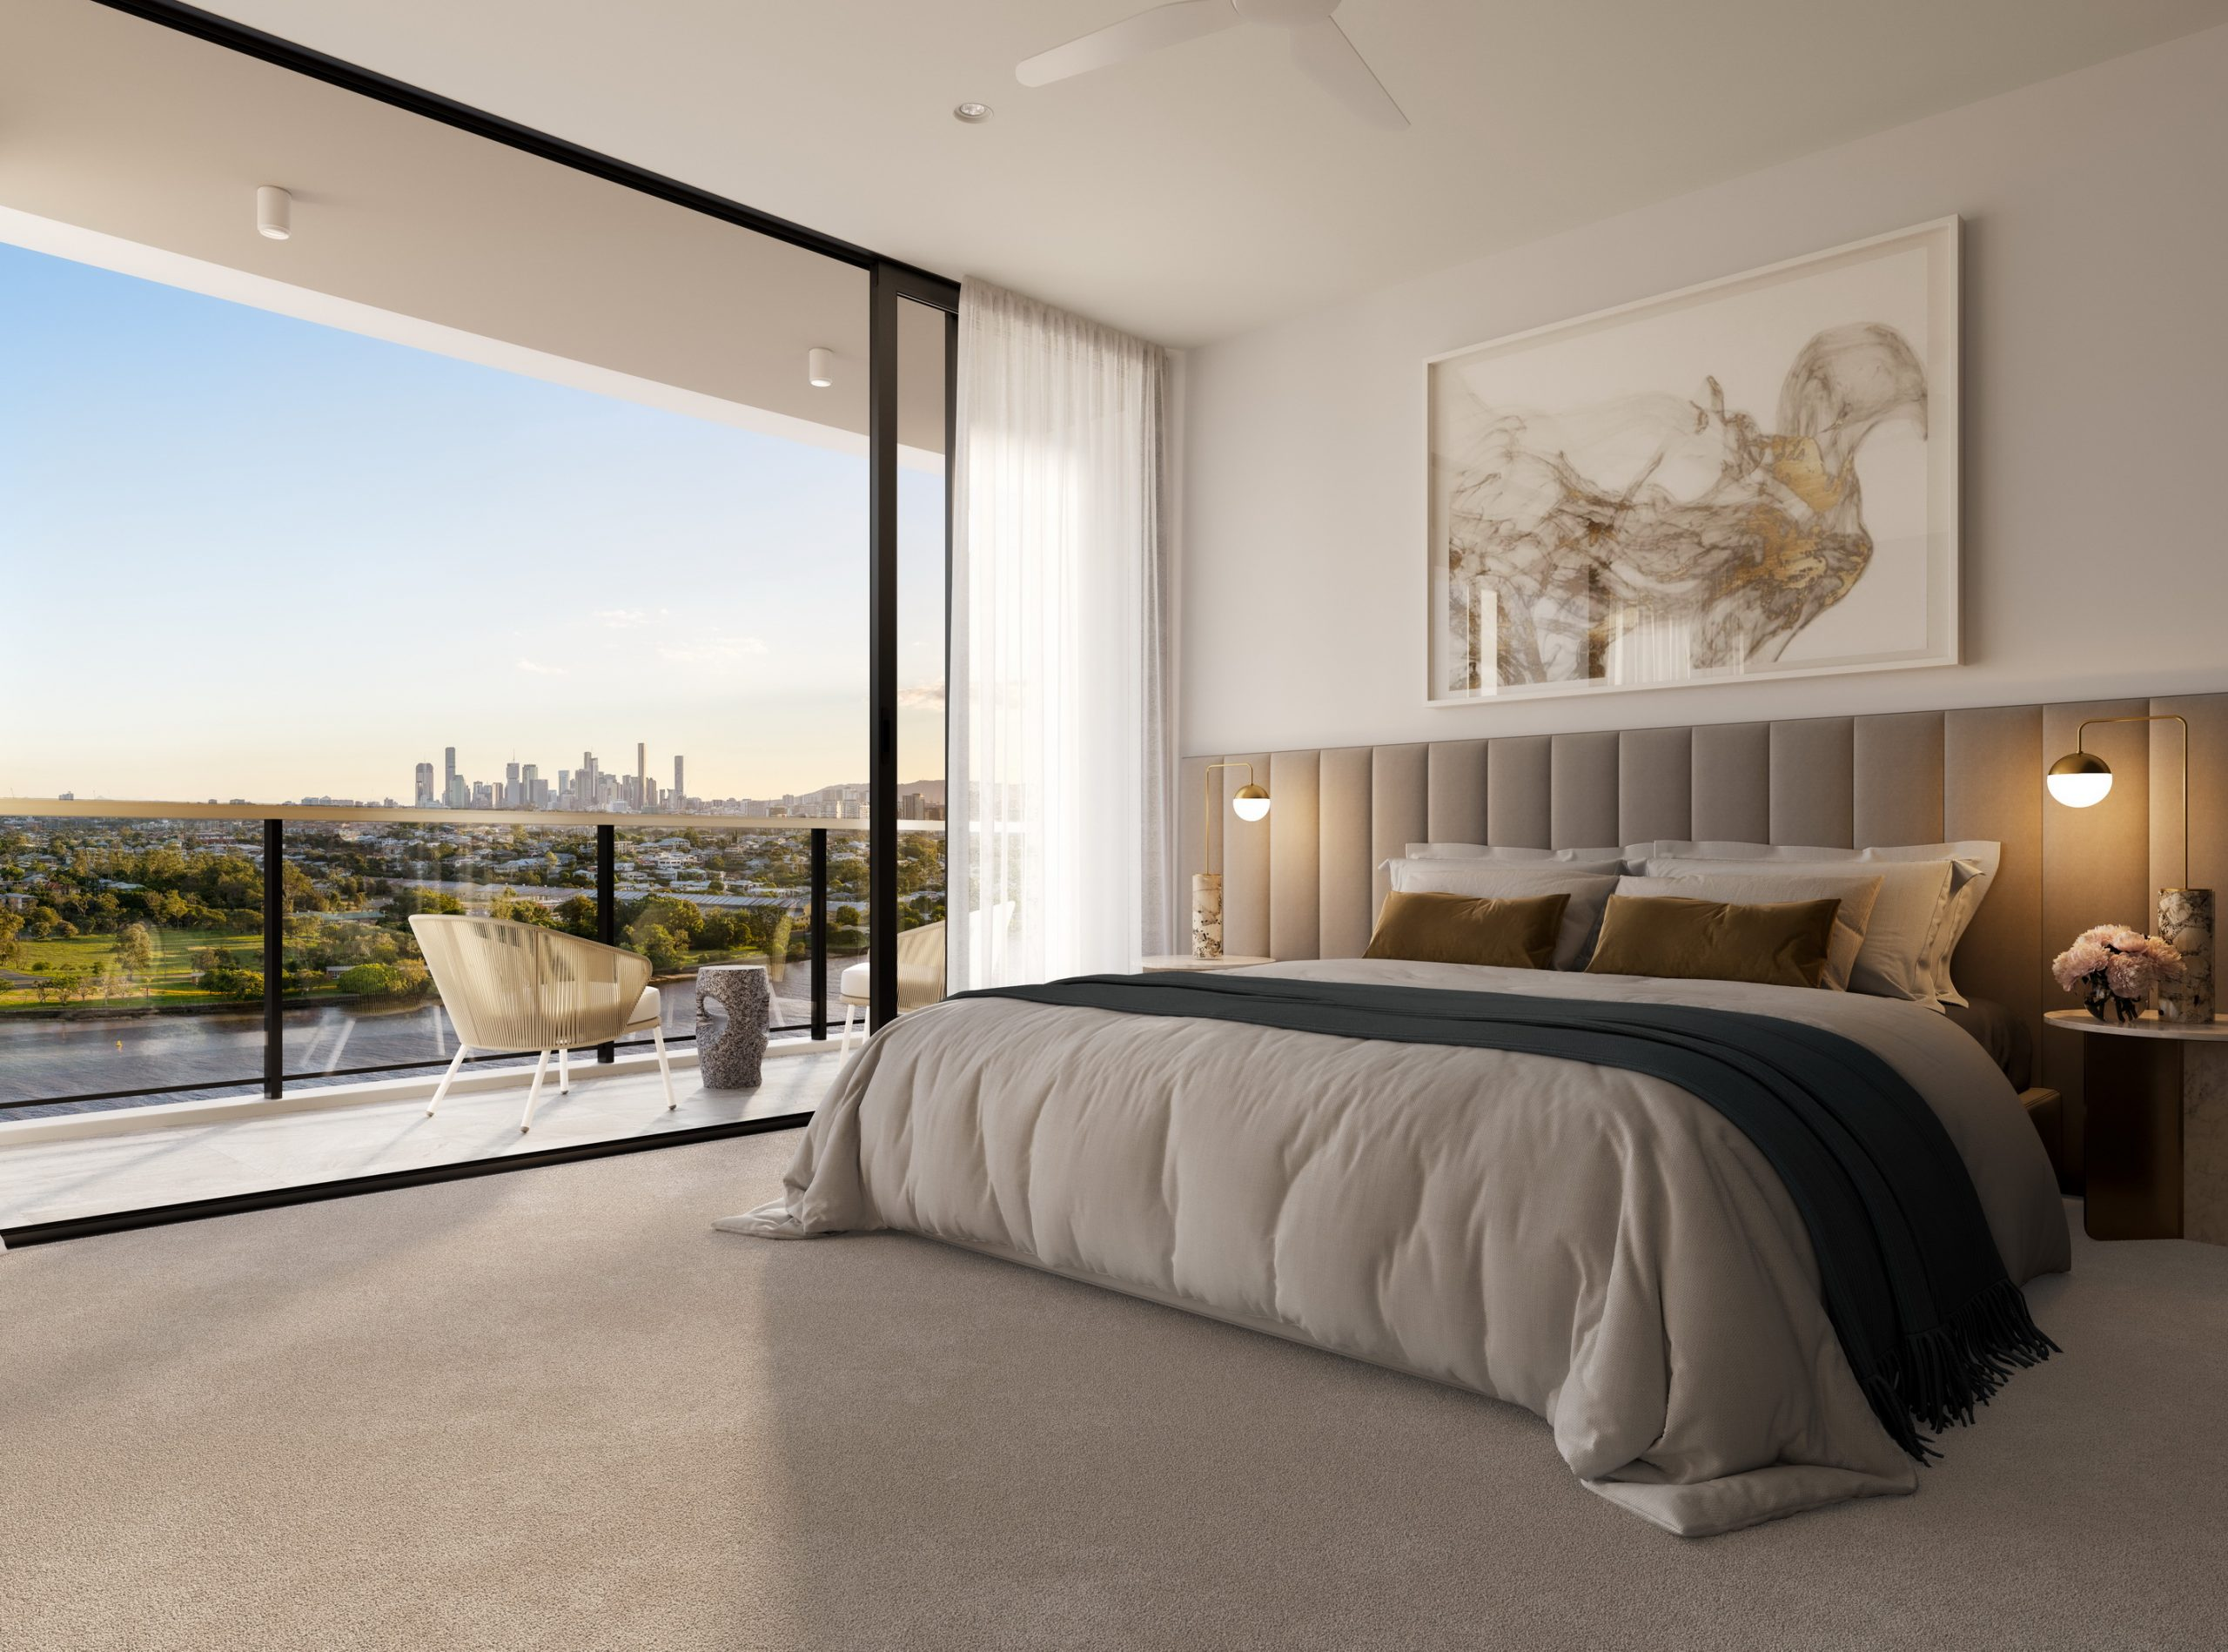 Rivello-queensland-render-3d-fkd-studio-architecture-luxury-interior-design-bedroom-penthouse